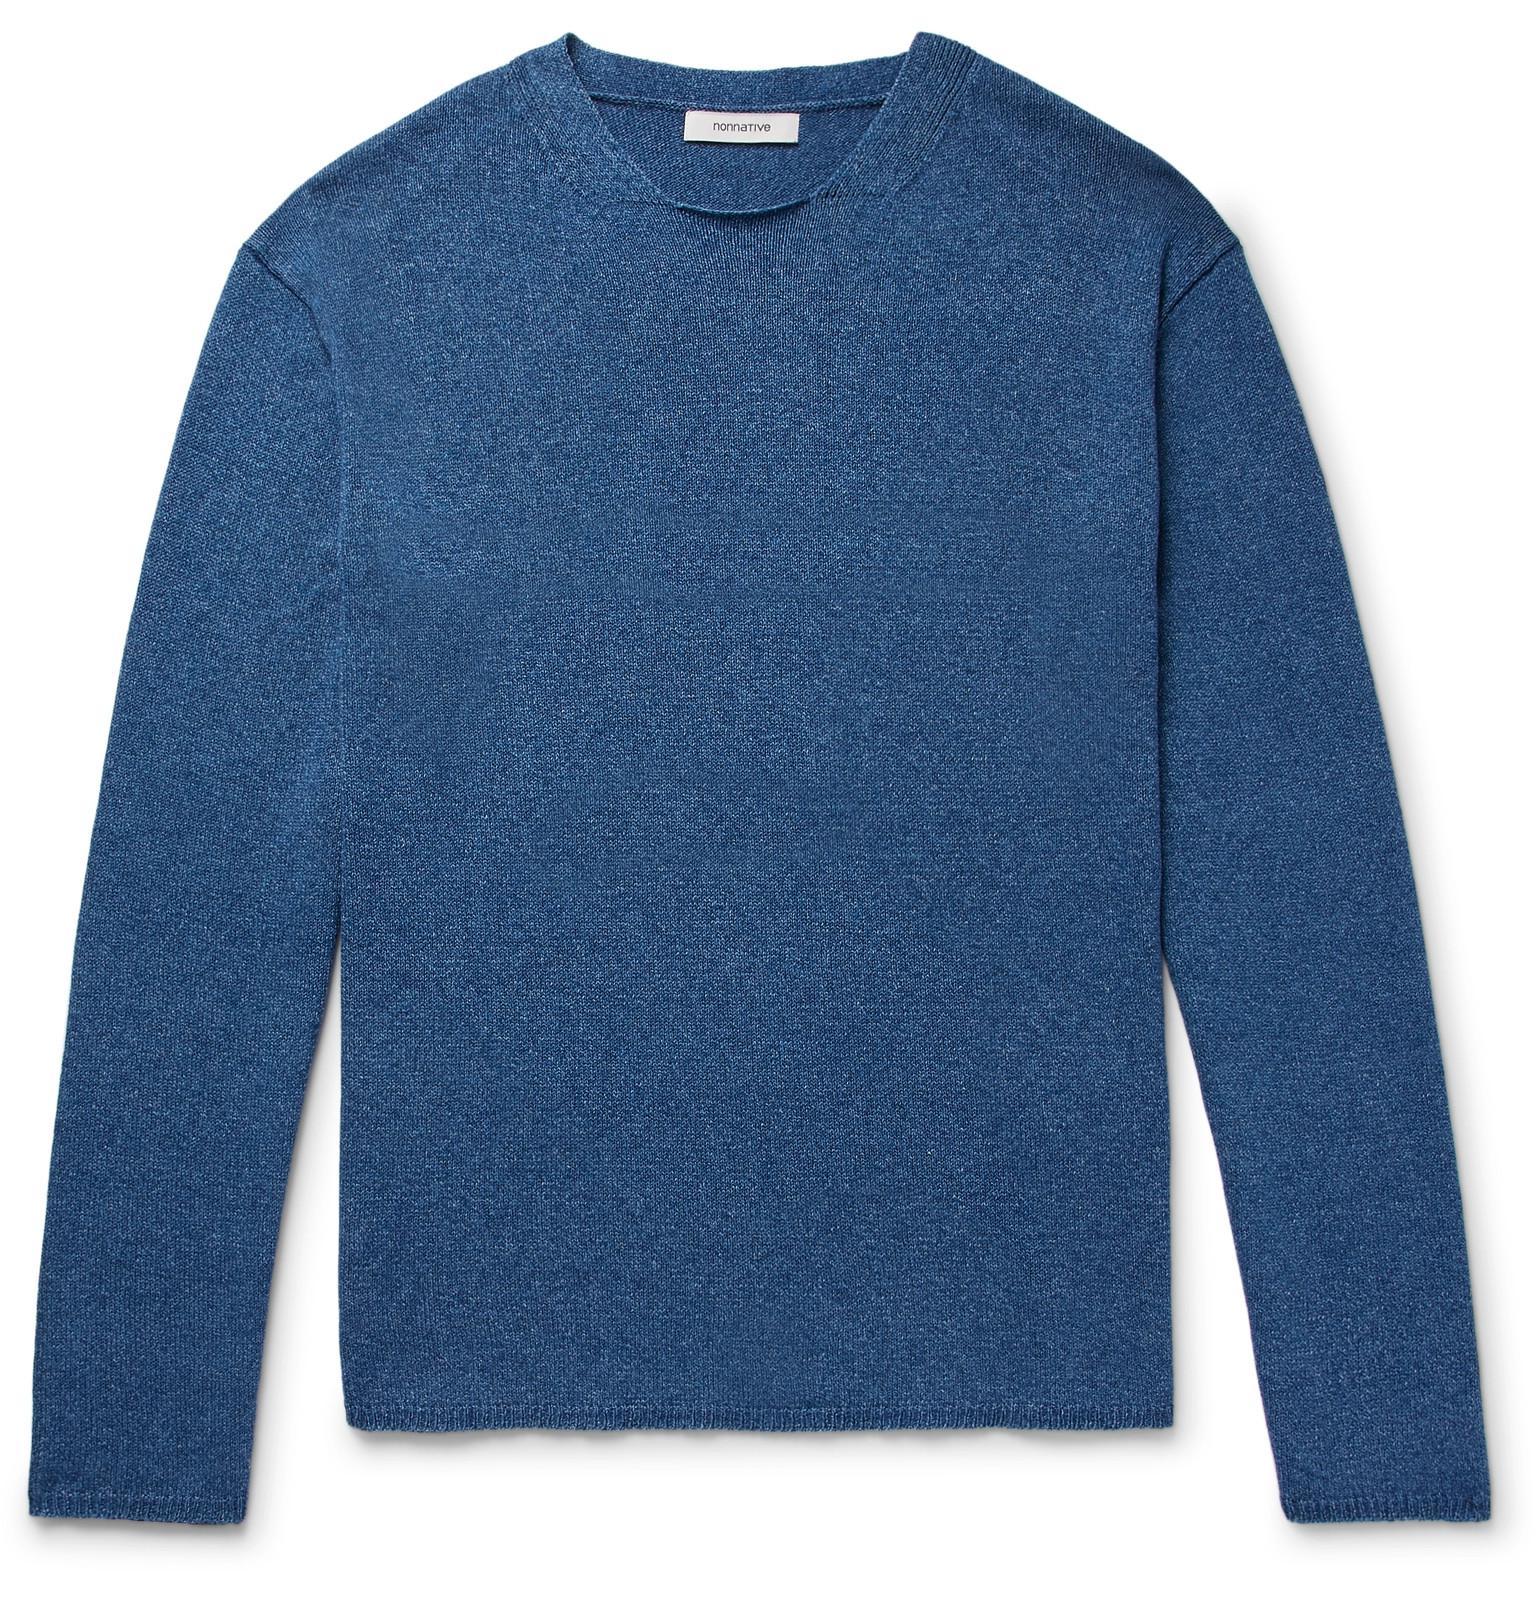 NONNATIVE Indigo-dyed Mélange Cotton Sweater - Blue OtRdD90C2